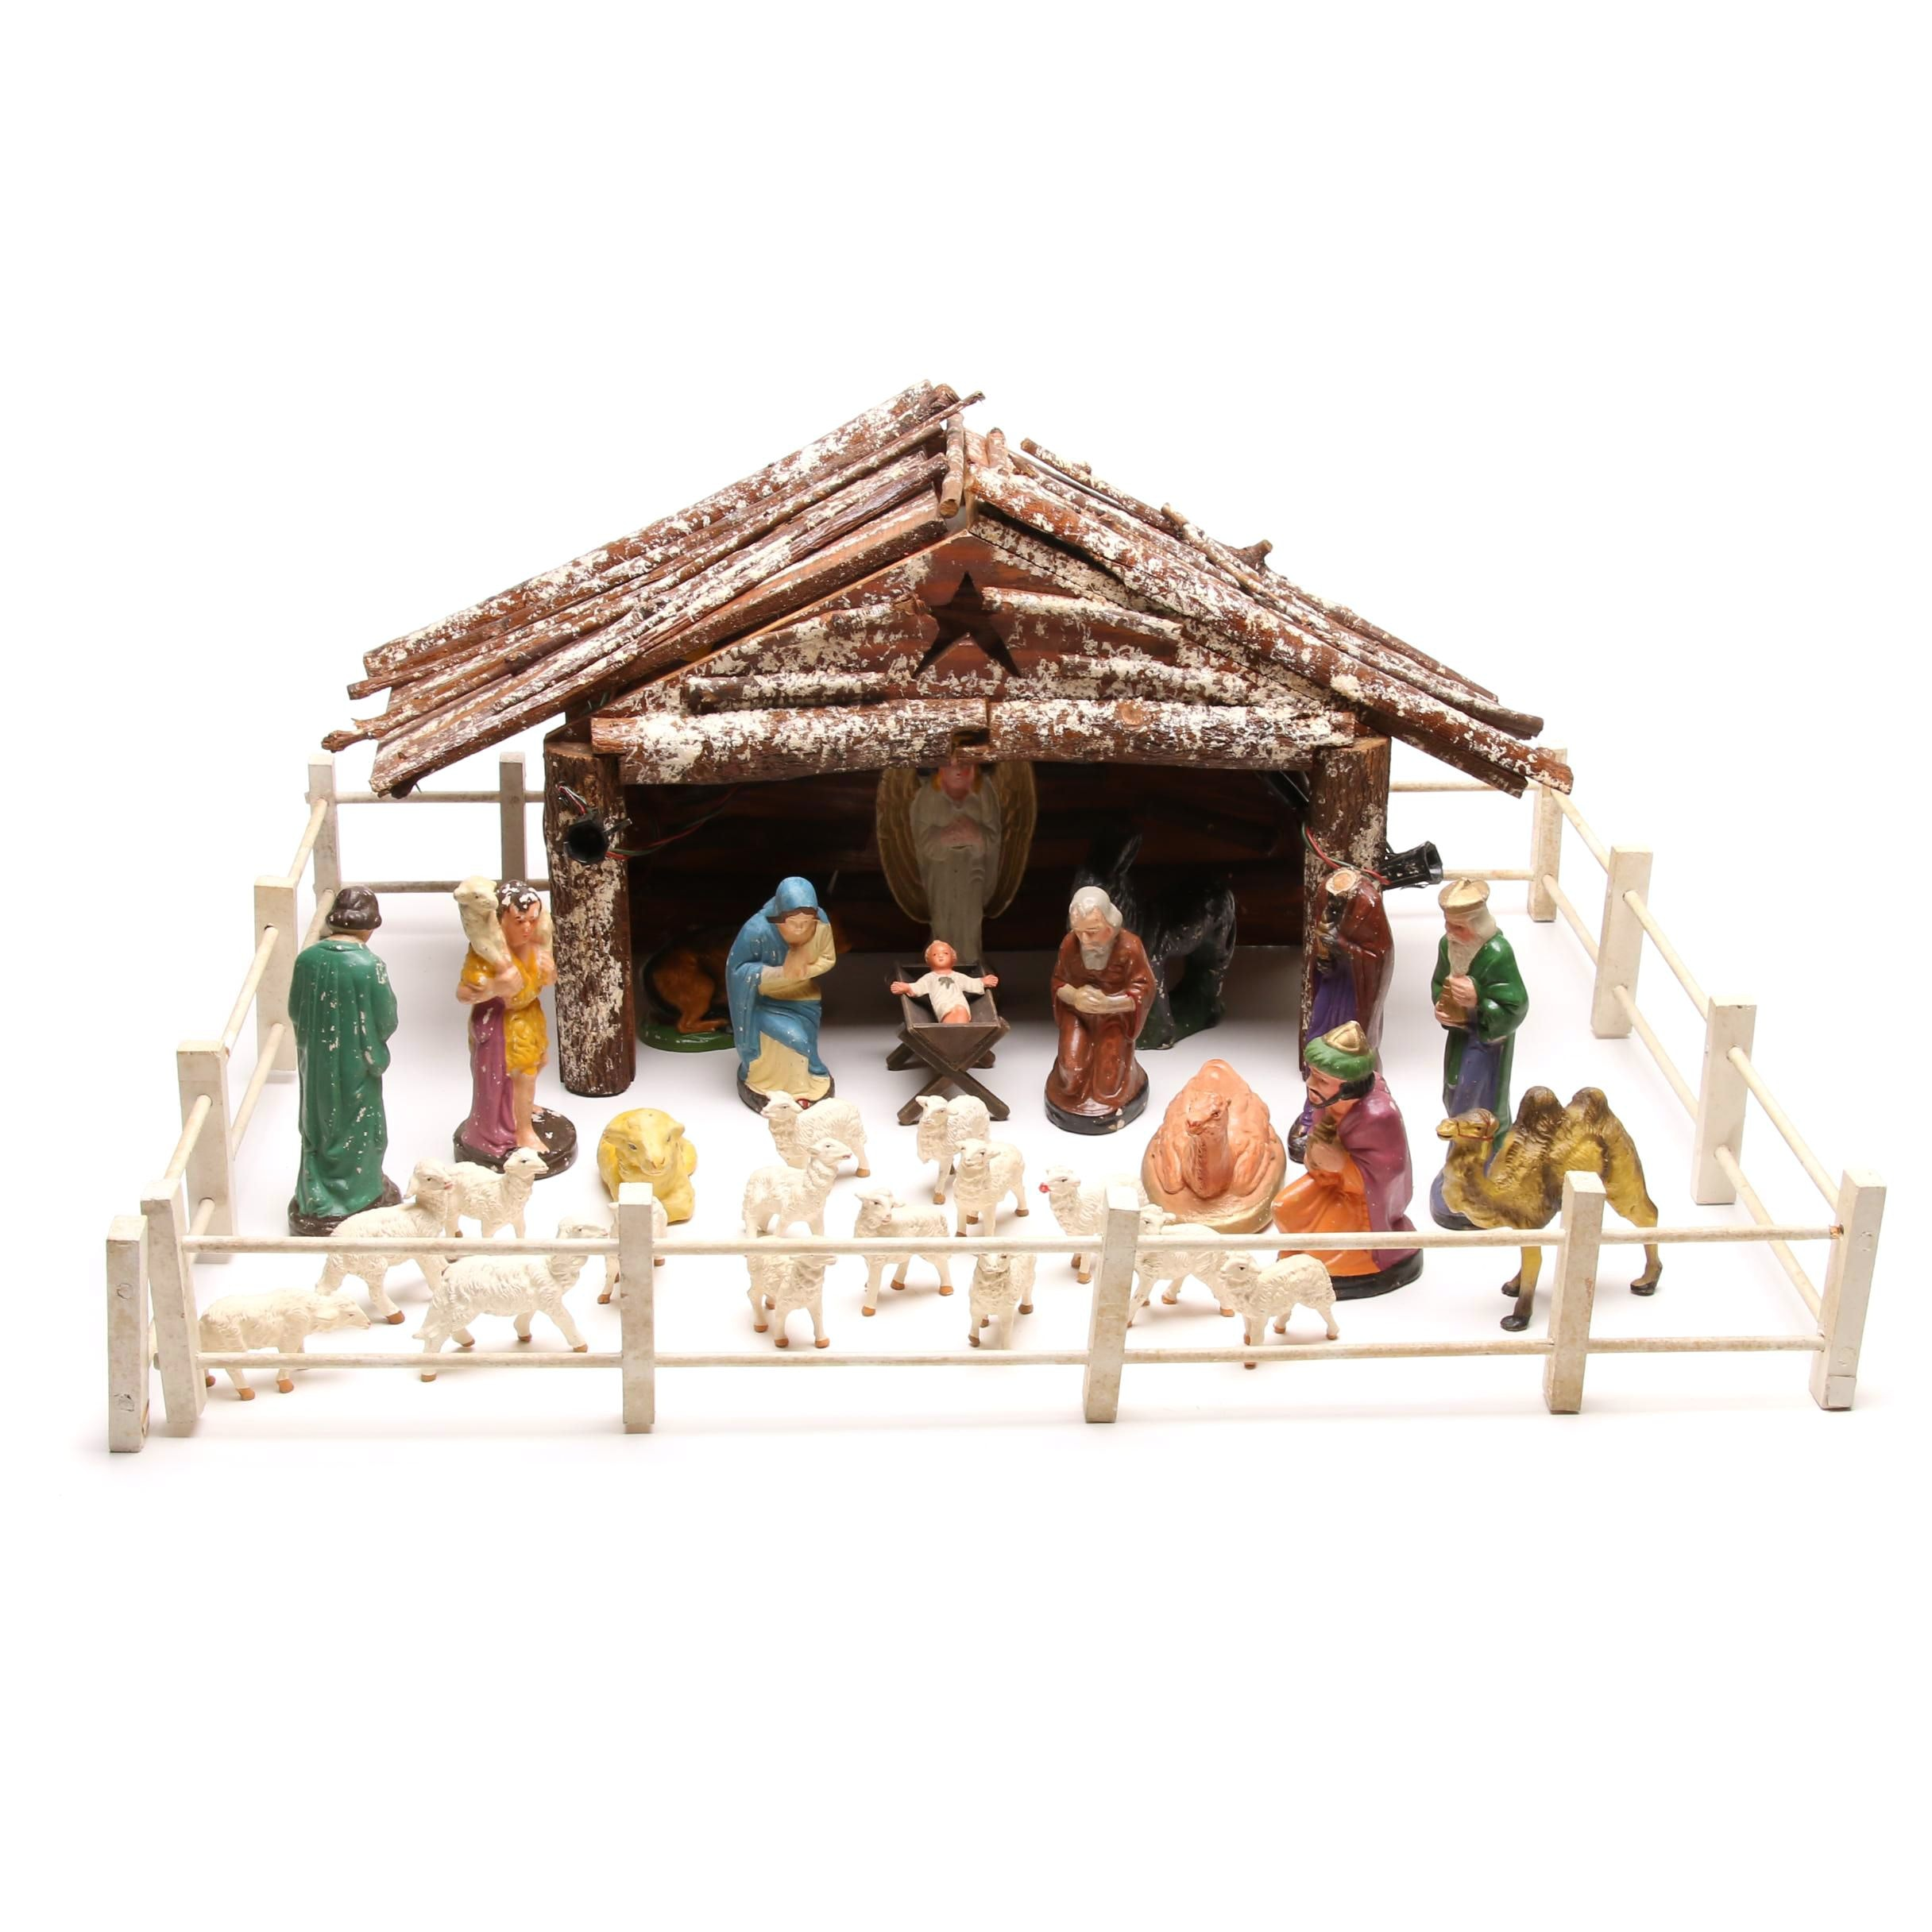 Christmas Tabletop Nativity Display, 1960s